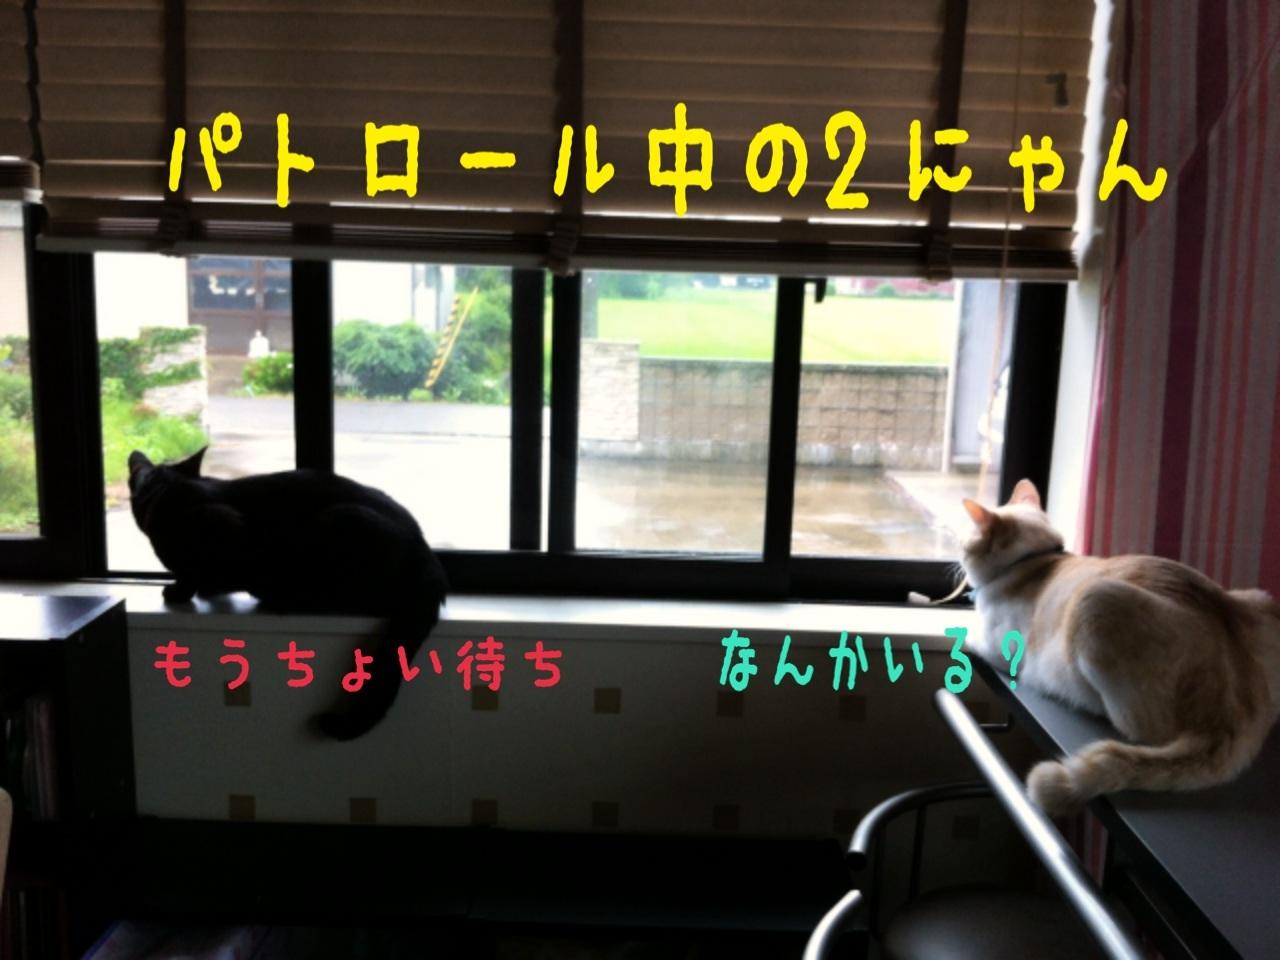 image_20130718193333.jpg